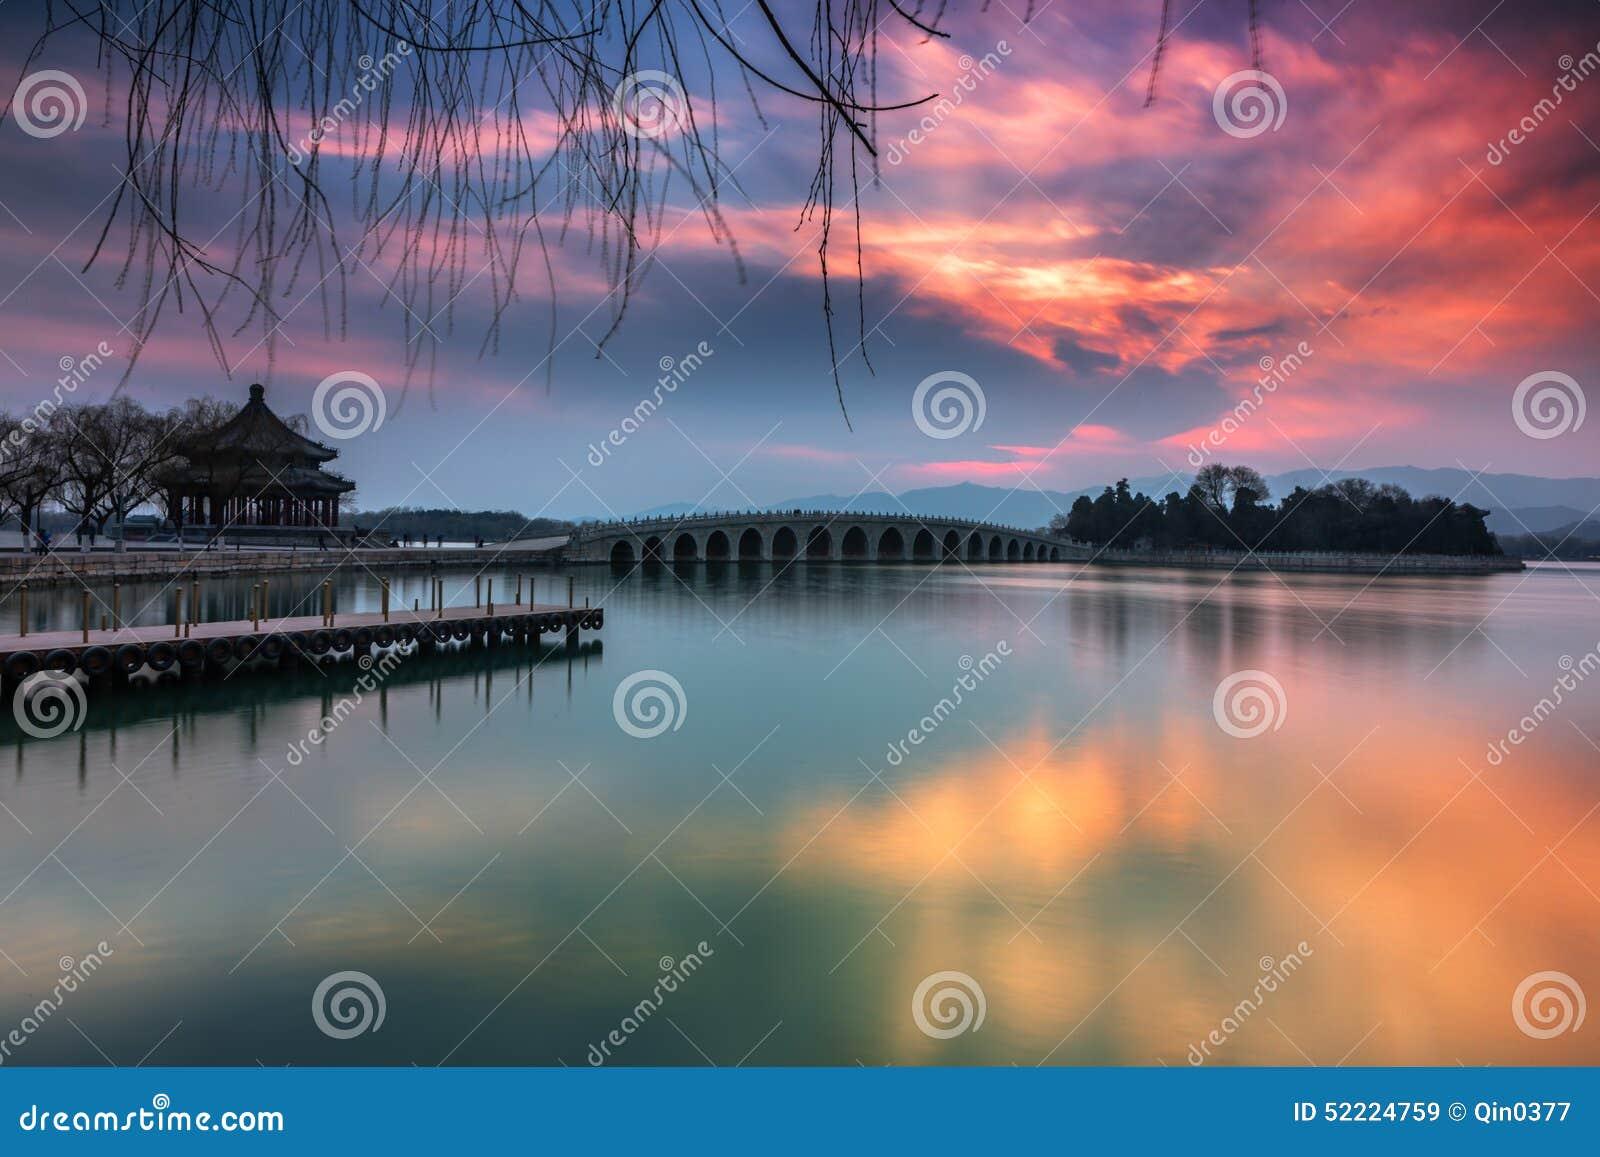 Der Sommer-Palast in Peking